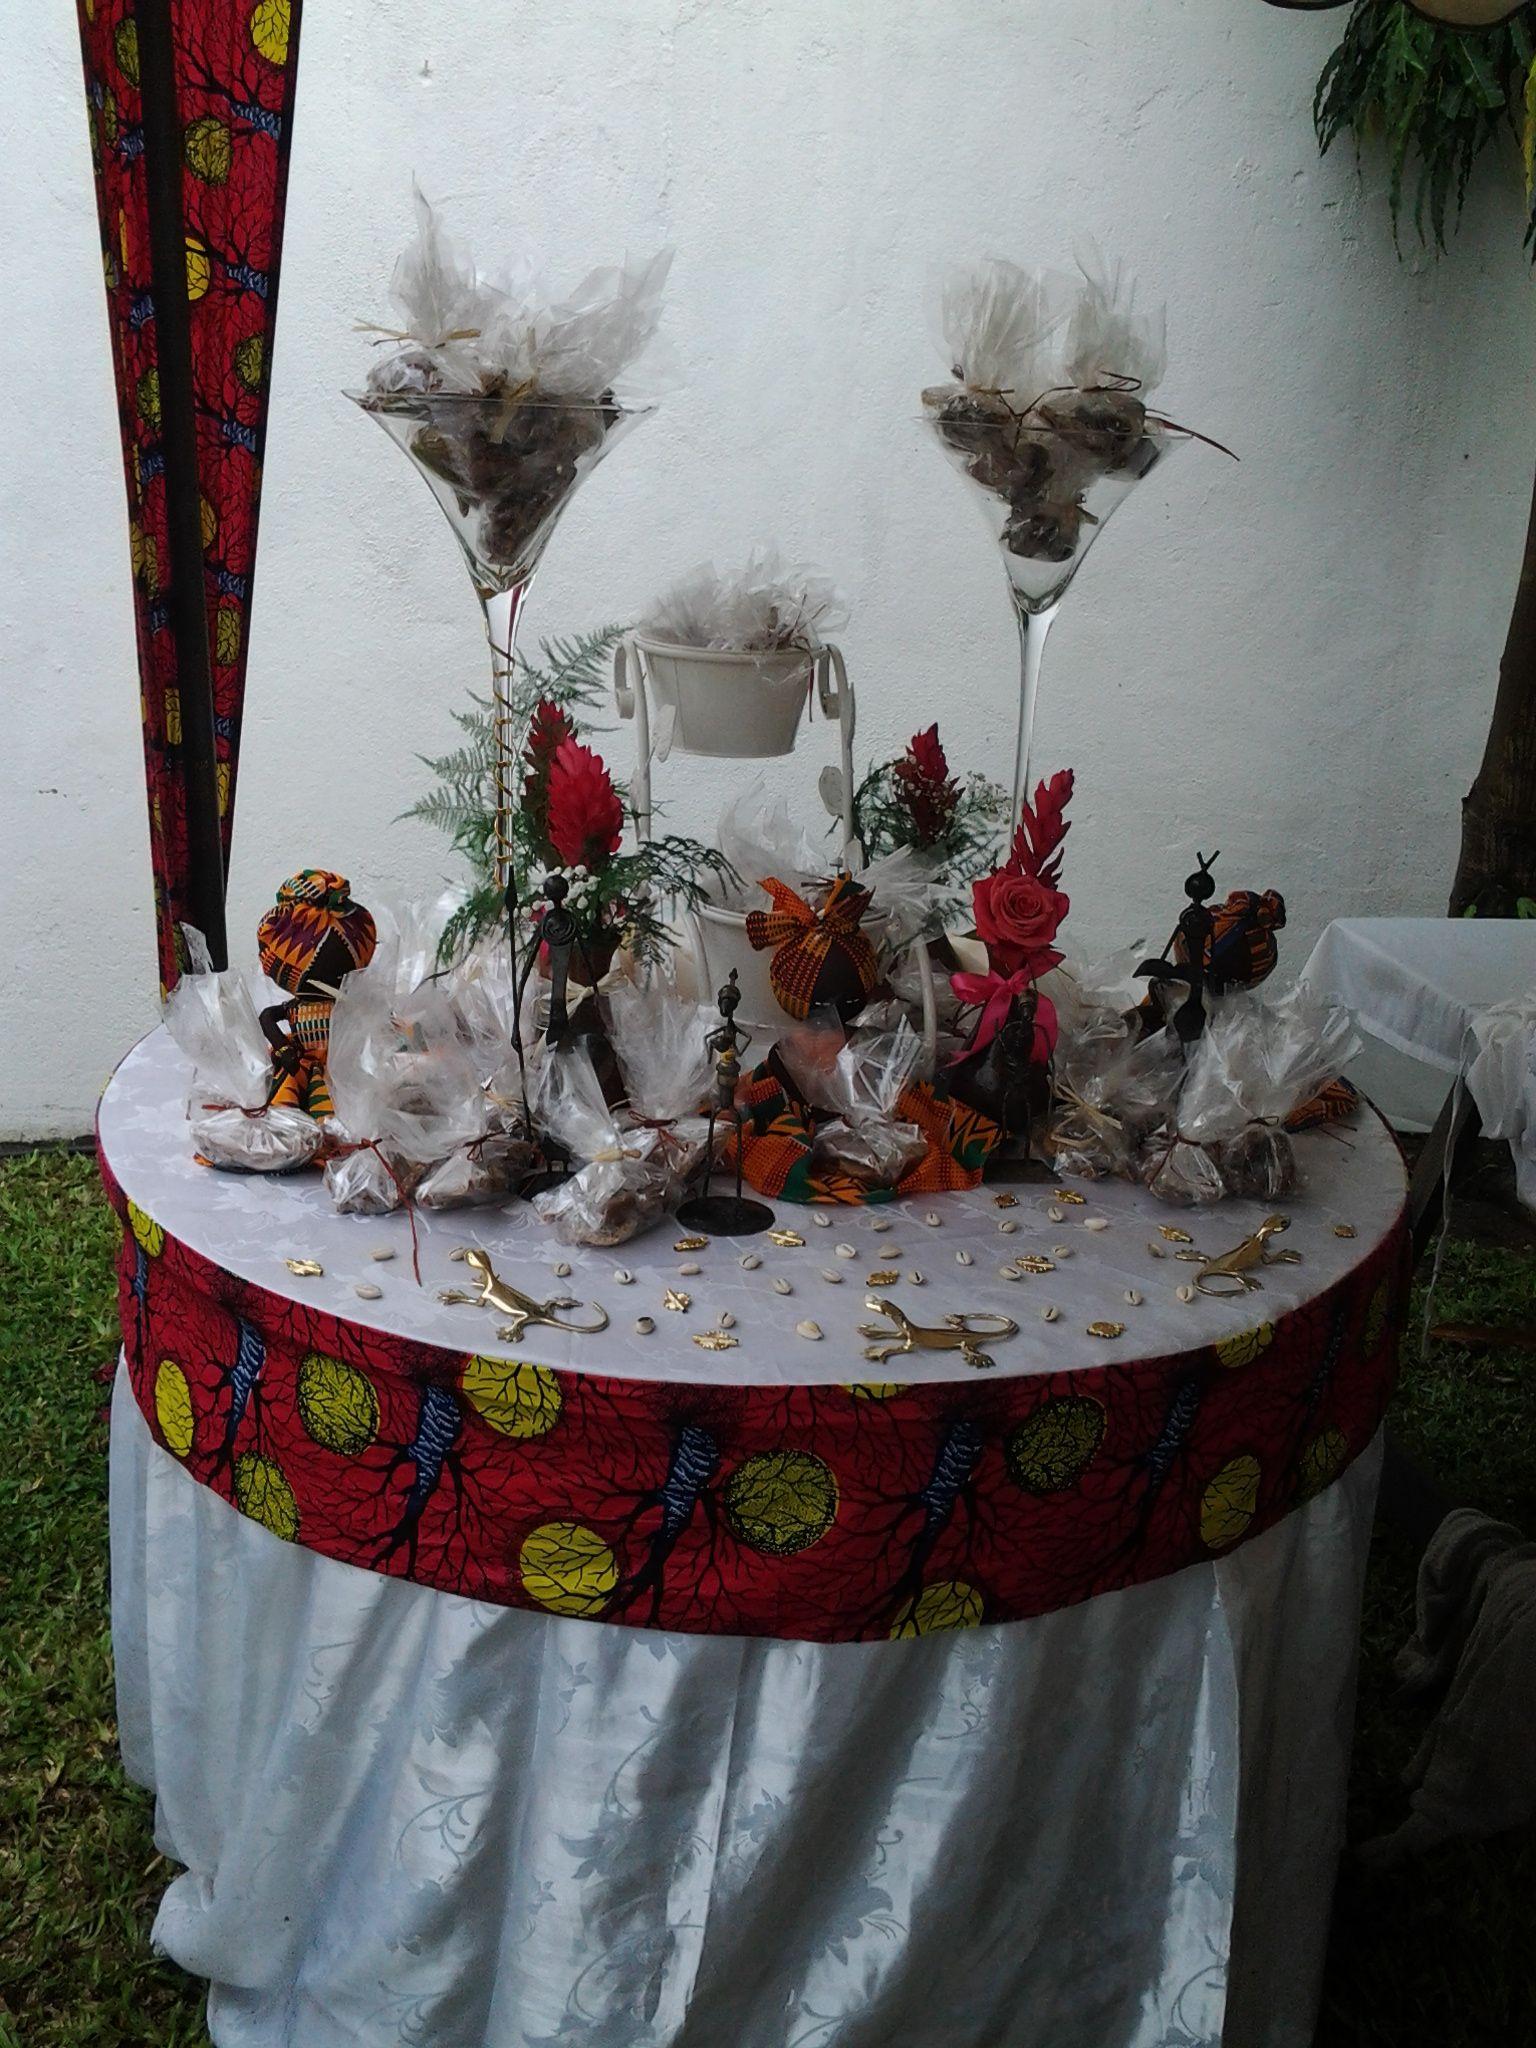 Decoration mariage coutumier en plein air - Decoration mariage traditionnel ...